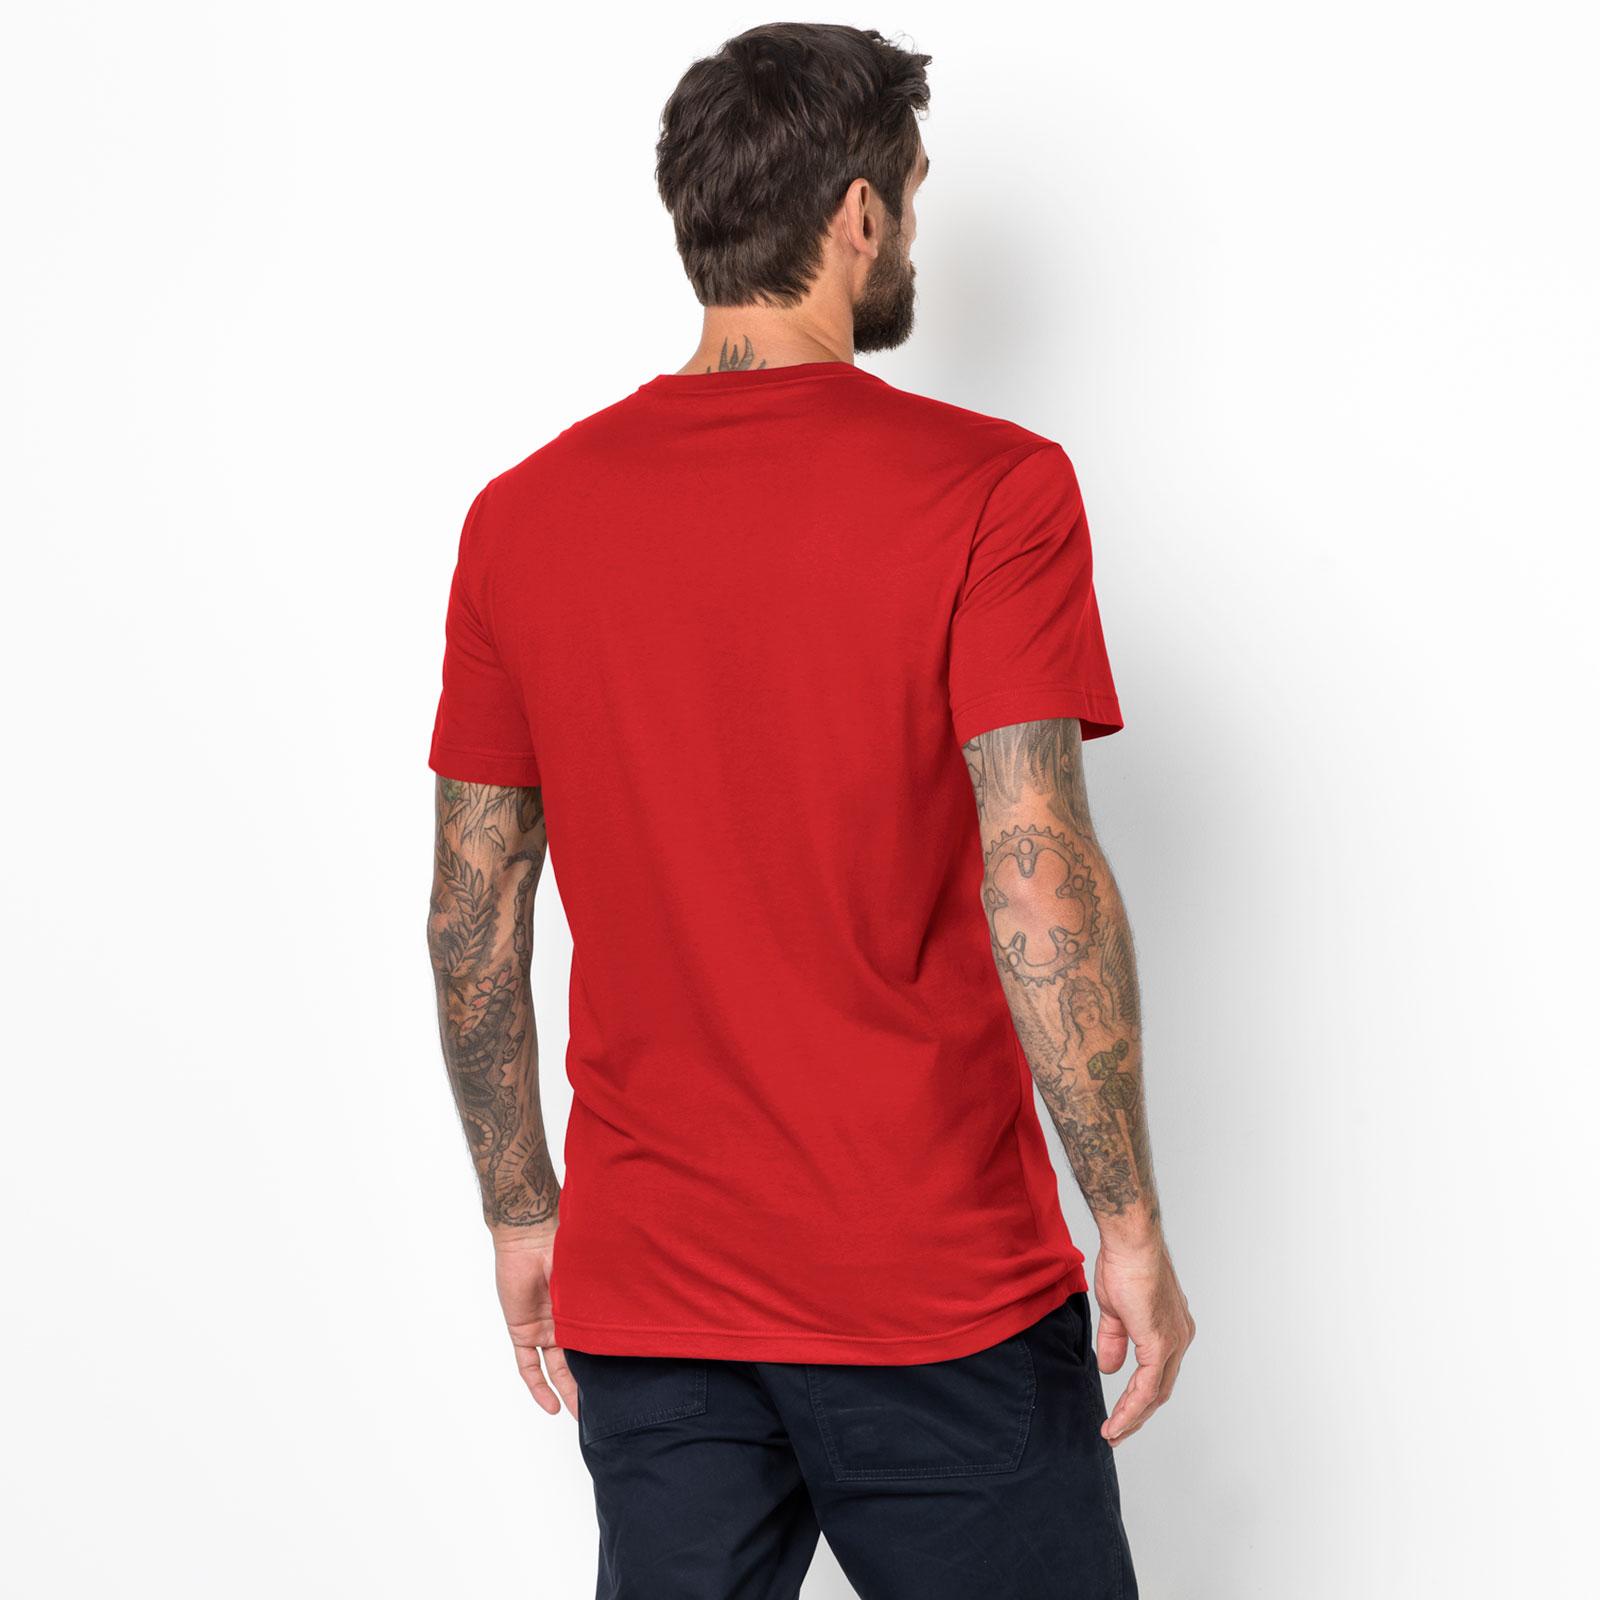 463b7f989d Jack Wolfskin Mens Essential Basic T-Shirt RRP £25   eBay